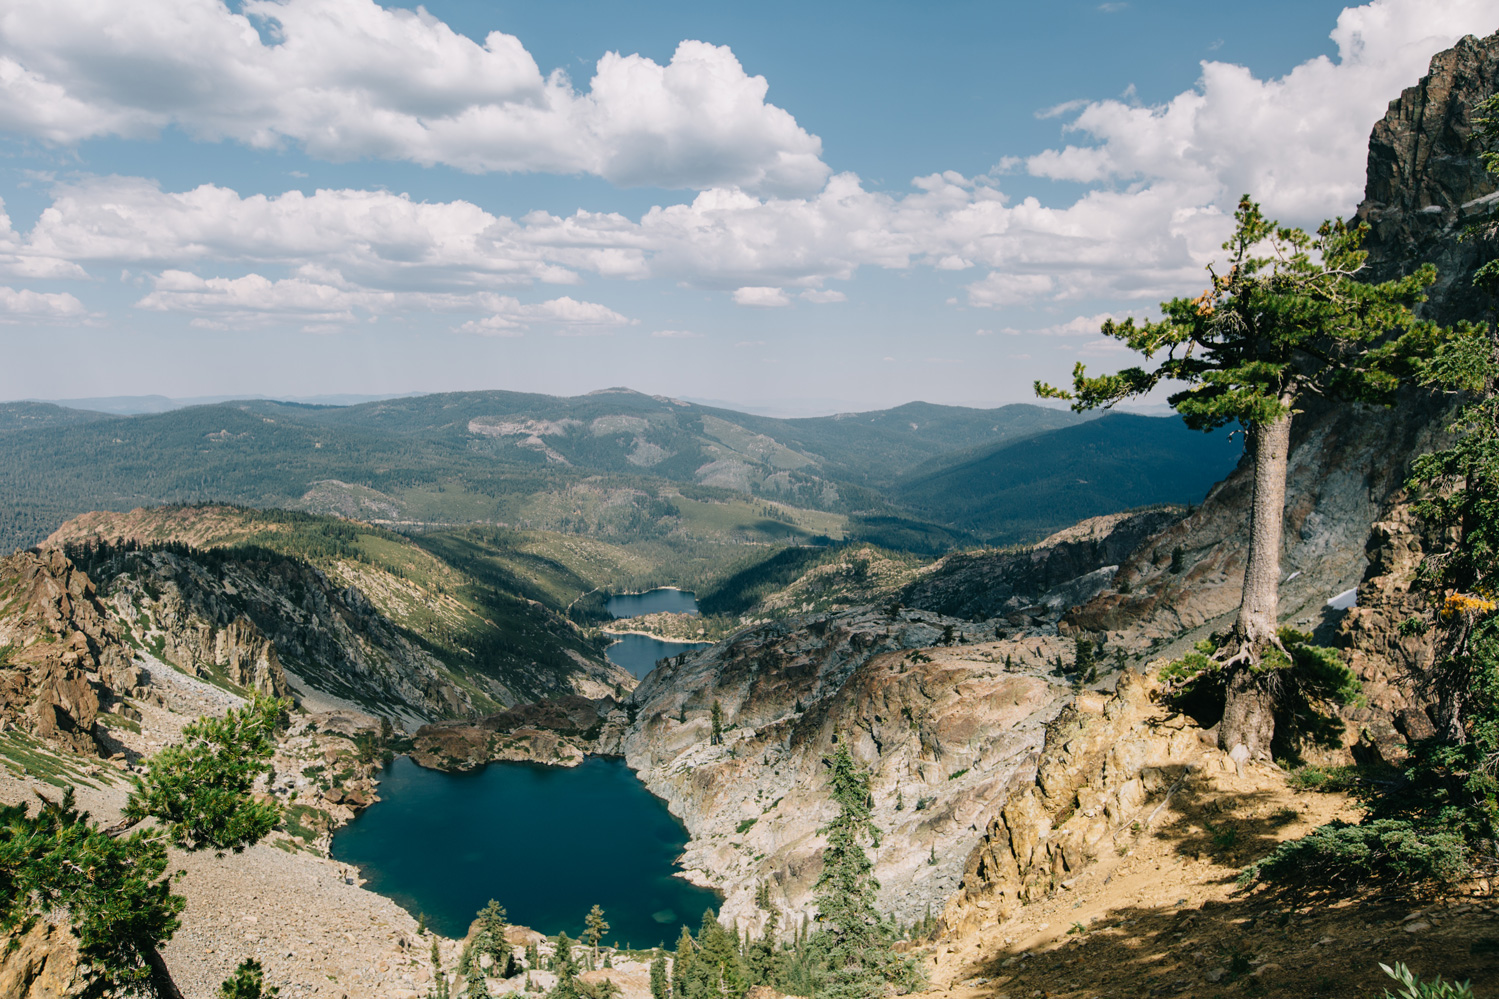 CindyGiovagnoli_outdoors_photographer_Sierra_Buttes_firetower_watchtower_Sardine_Snag_Bear_lake_hike_swim_camp-012.jpg